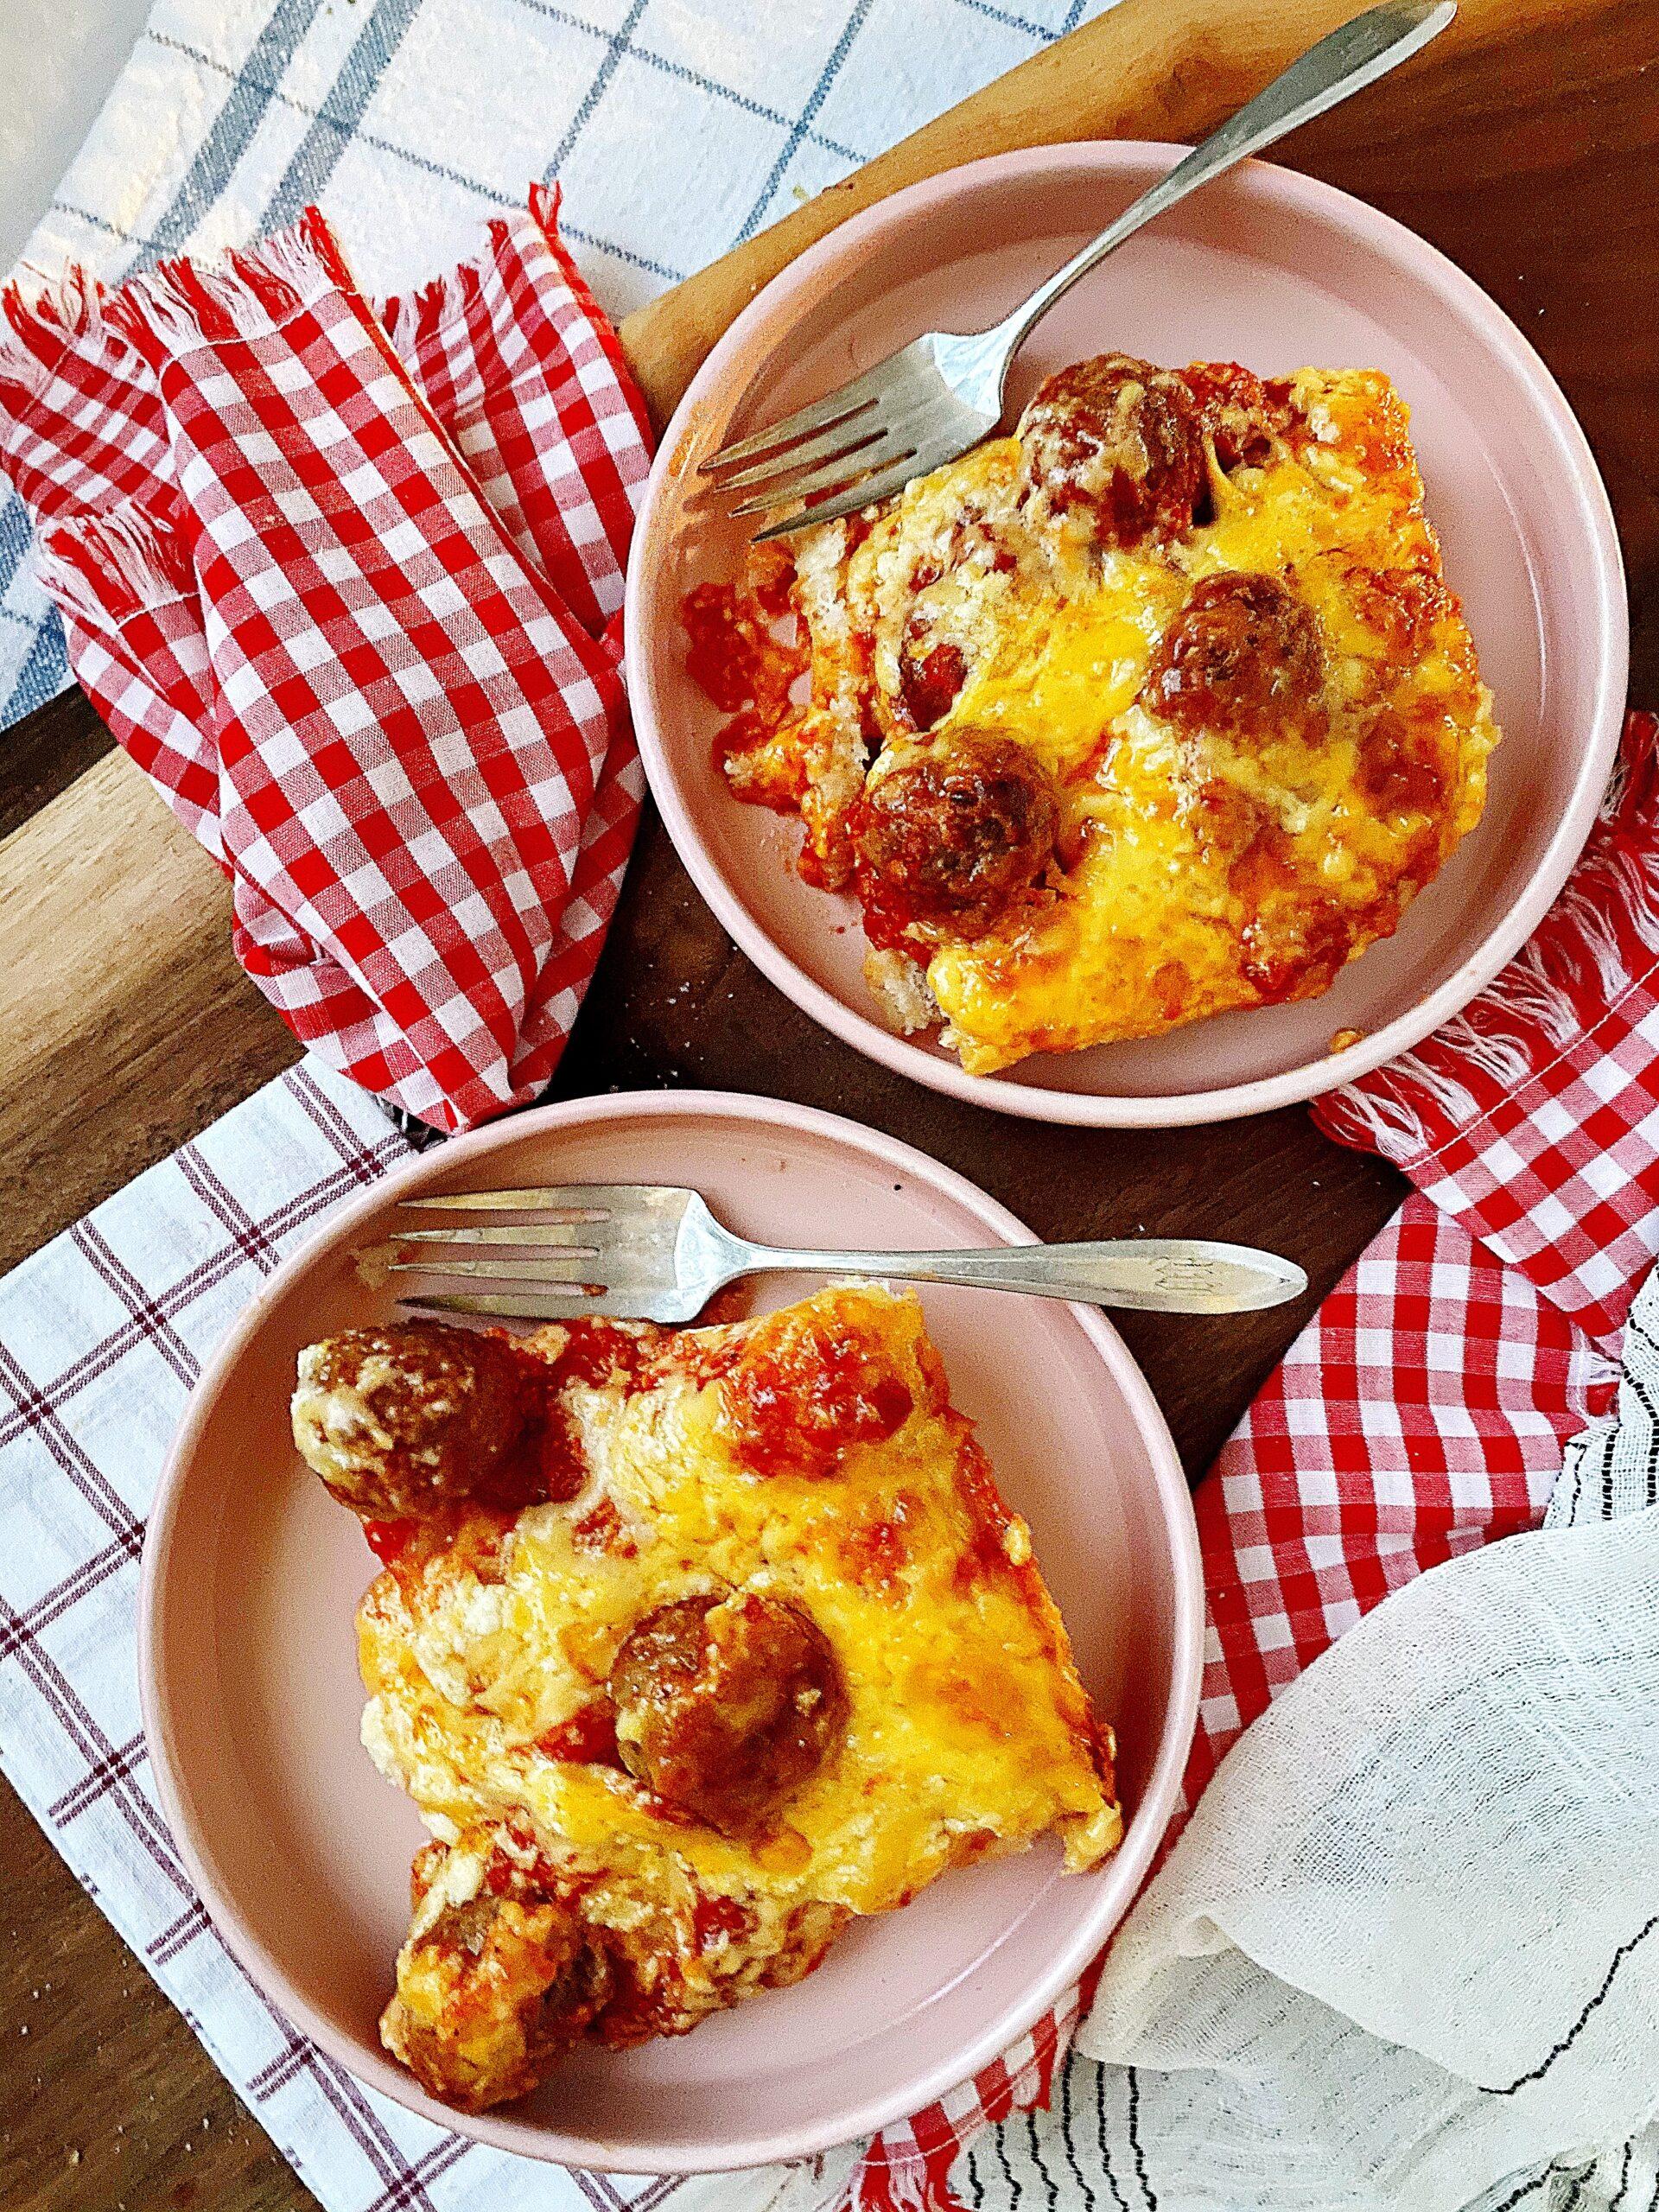 Cheesy Meatball Deep Dish Pizza